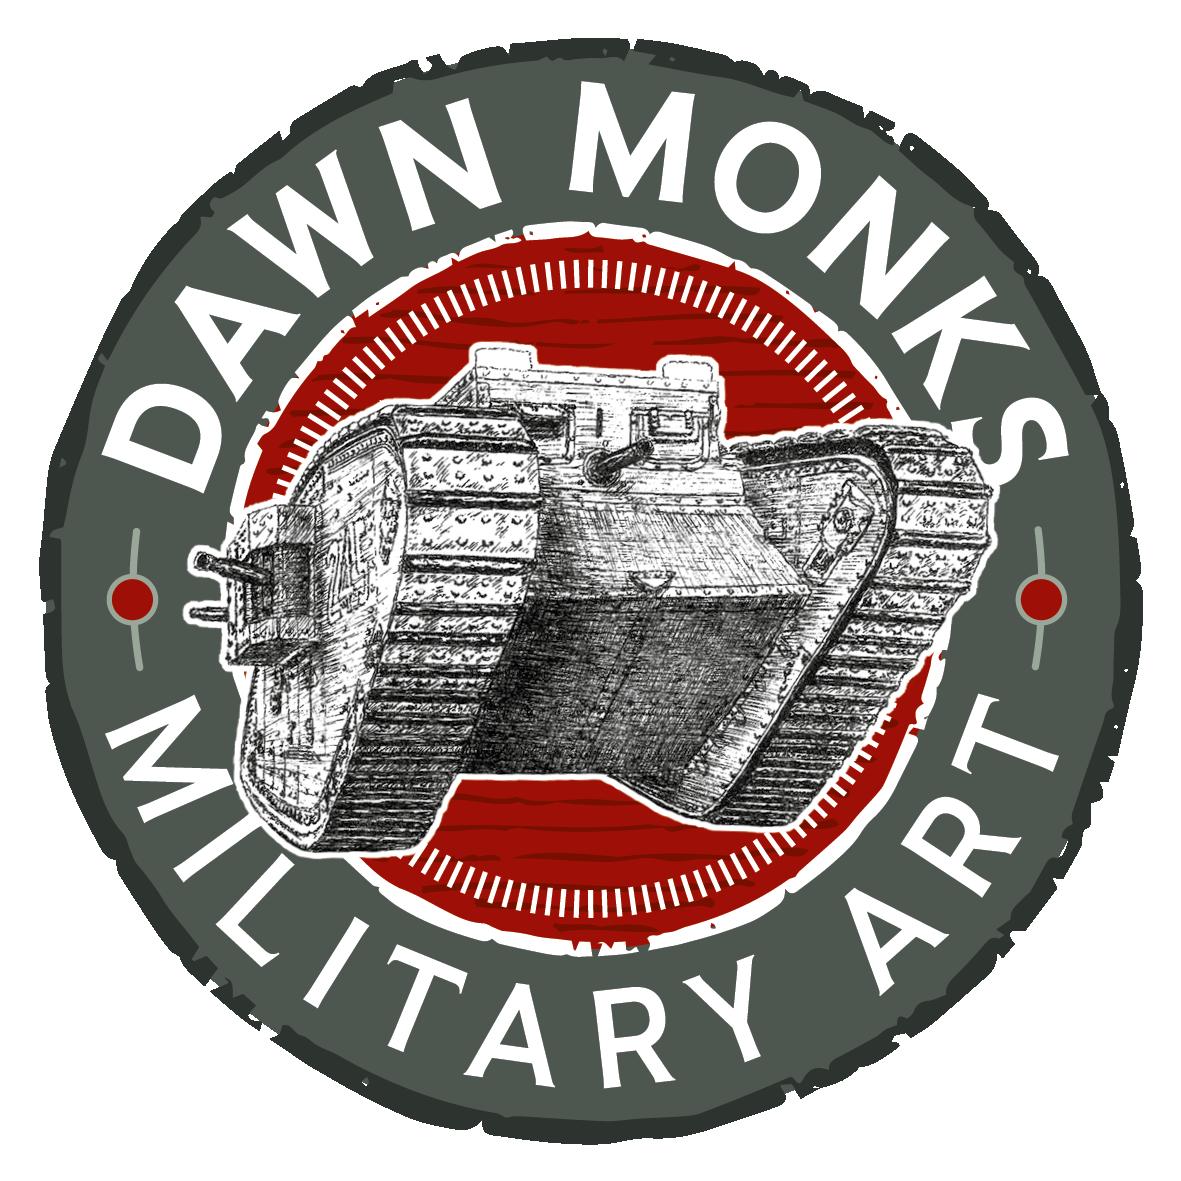 Dawn Monks Military Art & Illustrations